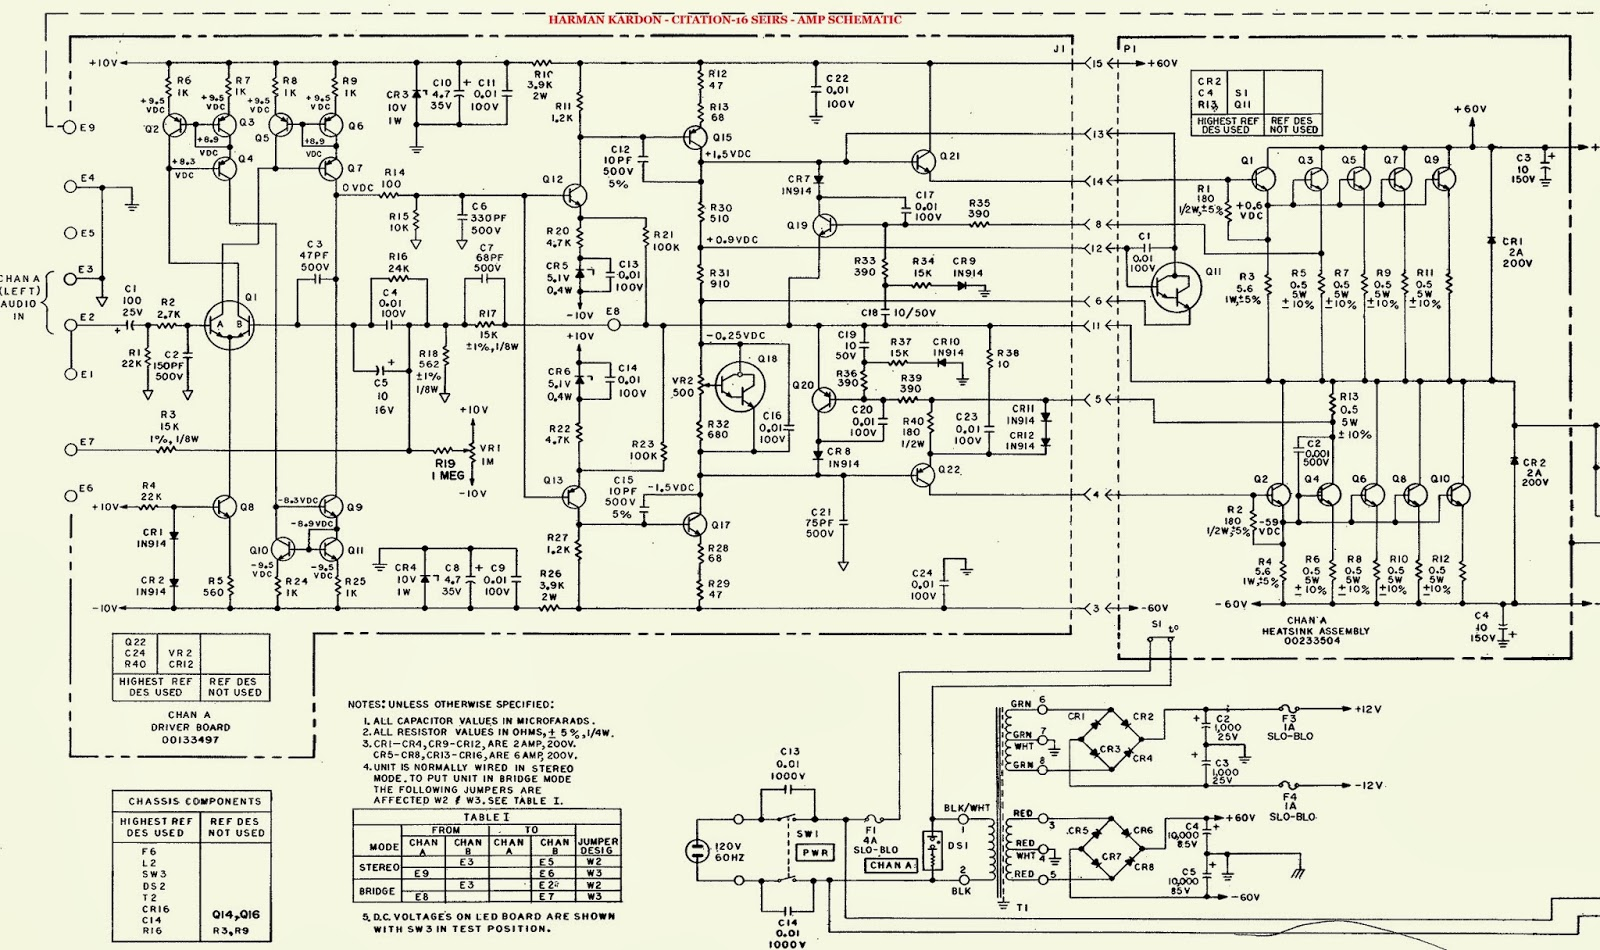 Bmw 5 Series Harman Kardon Wiring Diagram Books Of 1 Chevrolet Cobalt